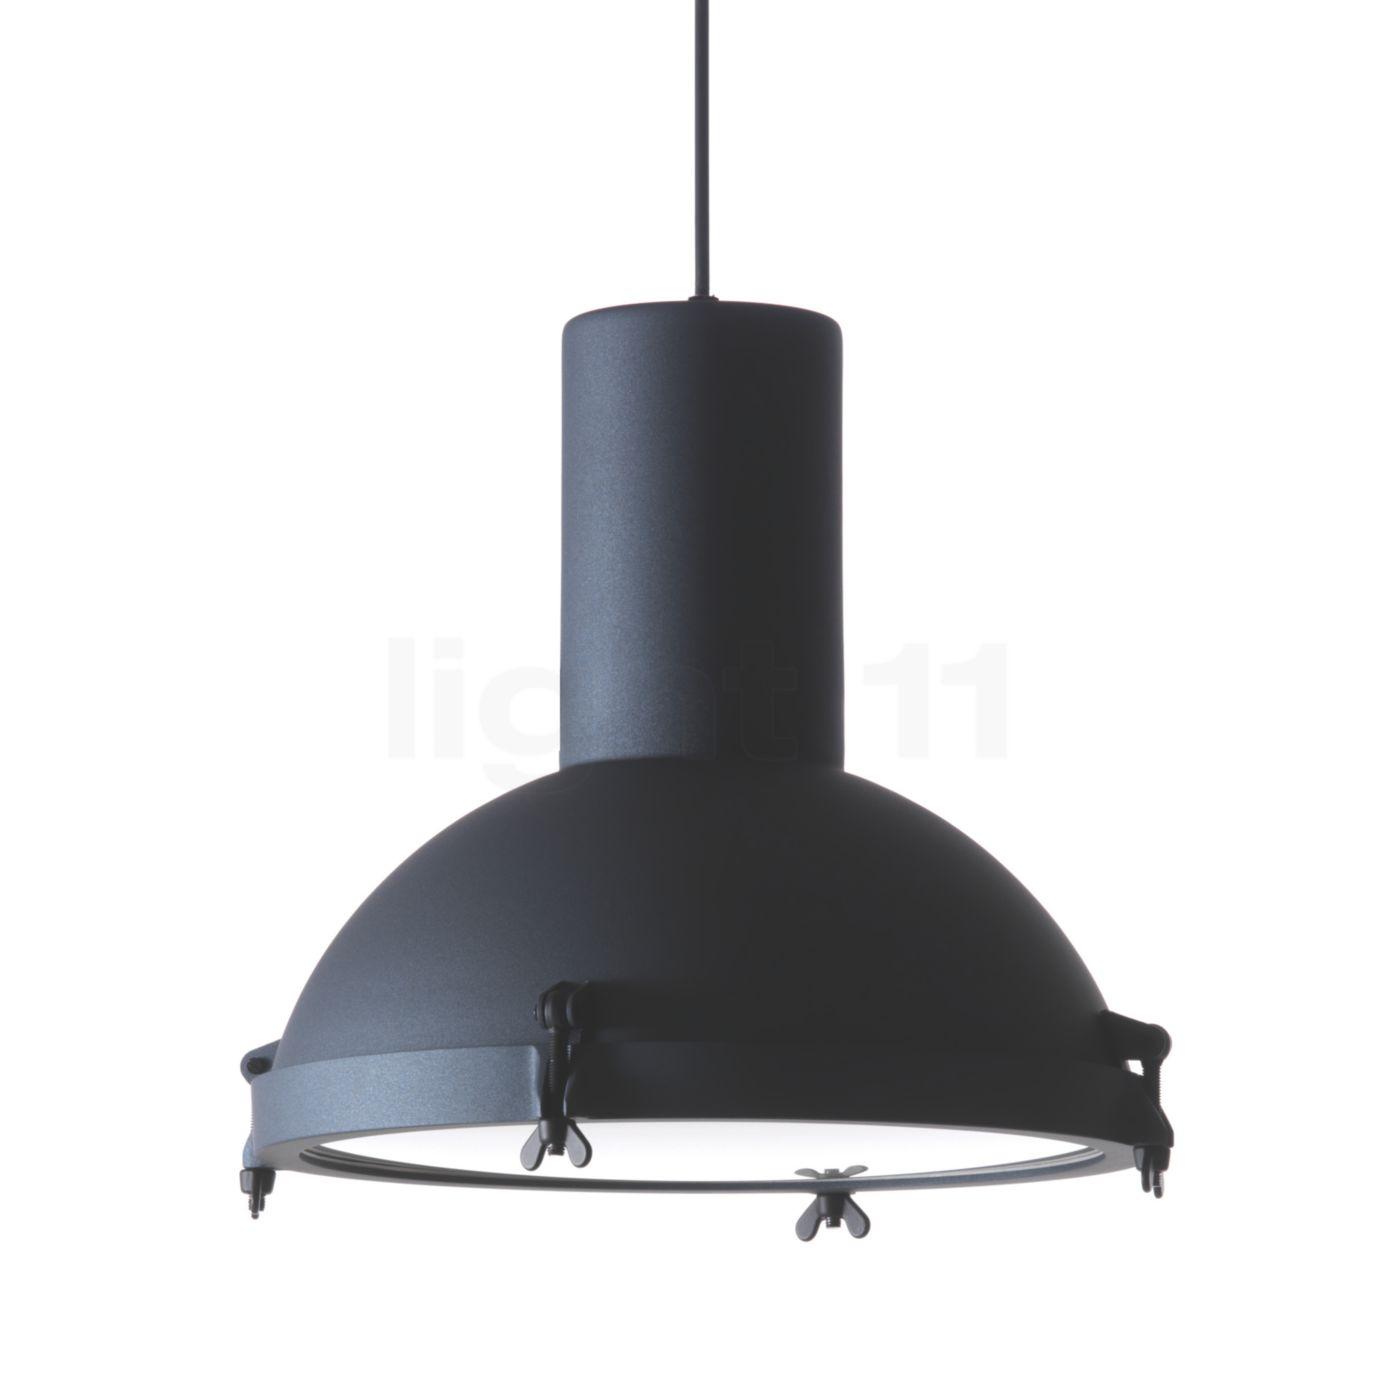 nemo projecteur 365 sospensione pendelleuchte. Black Bedroom Furniture Sets. Home Design Ideas